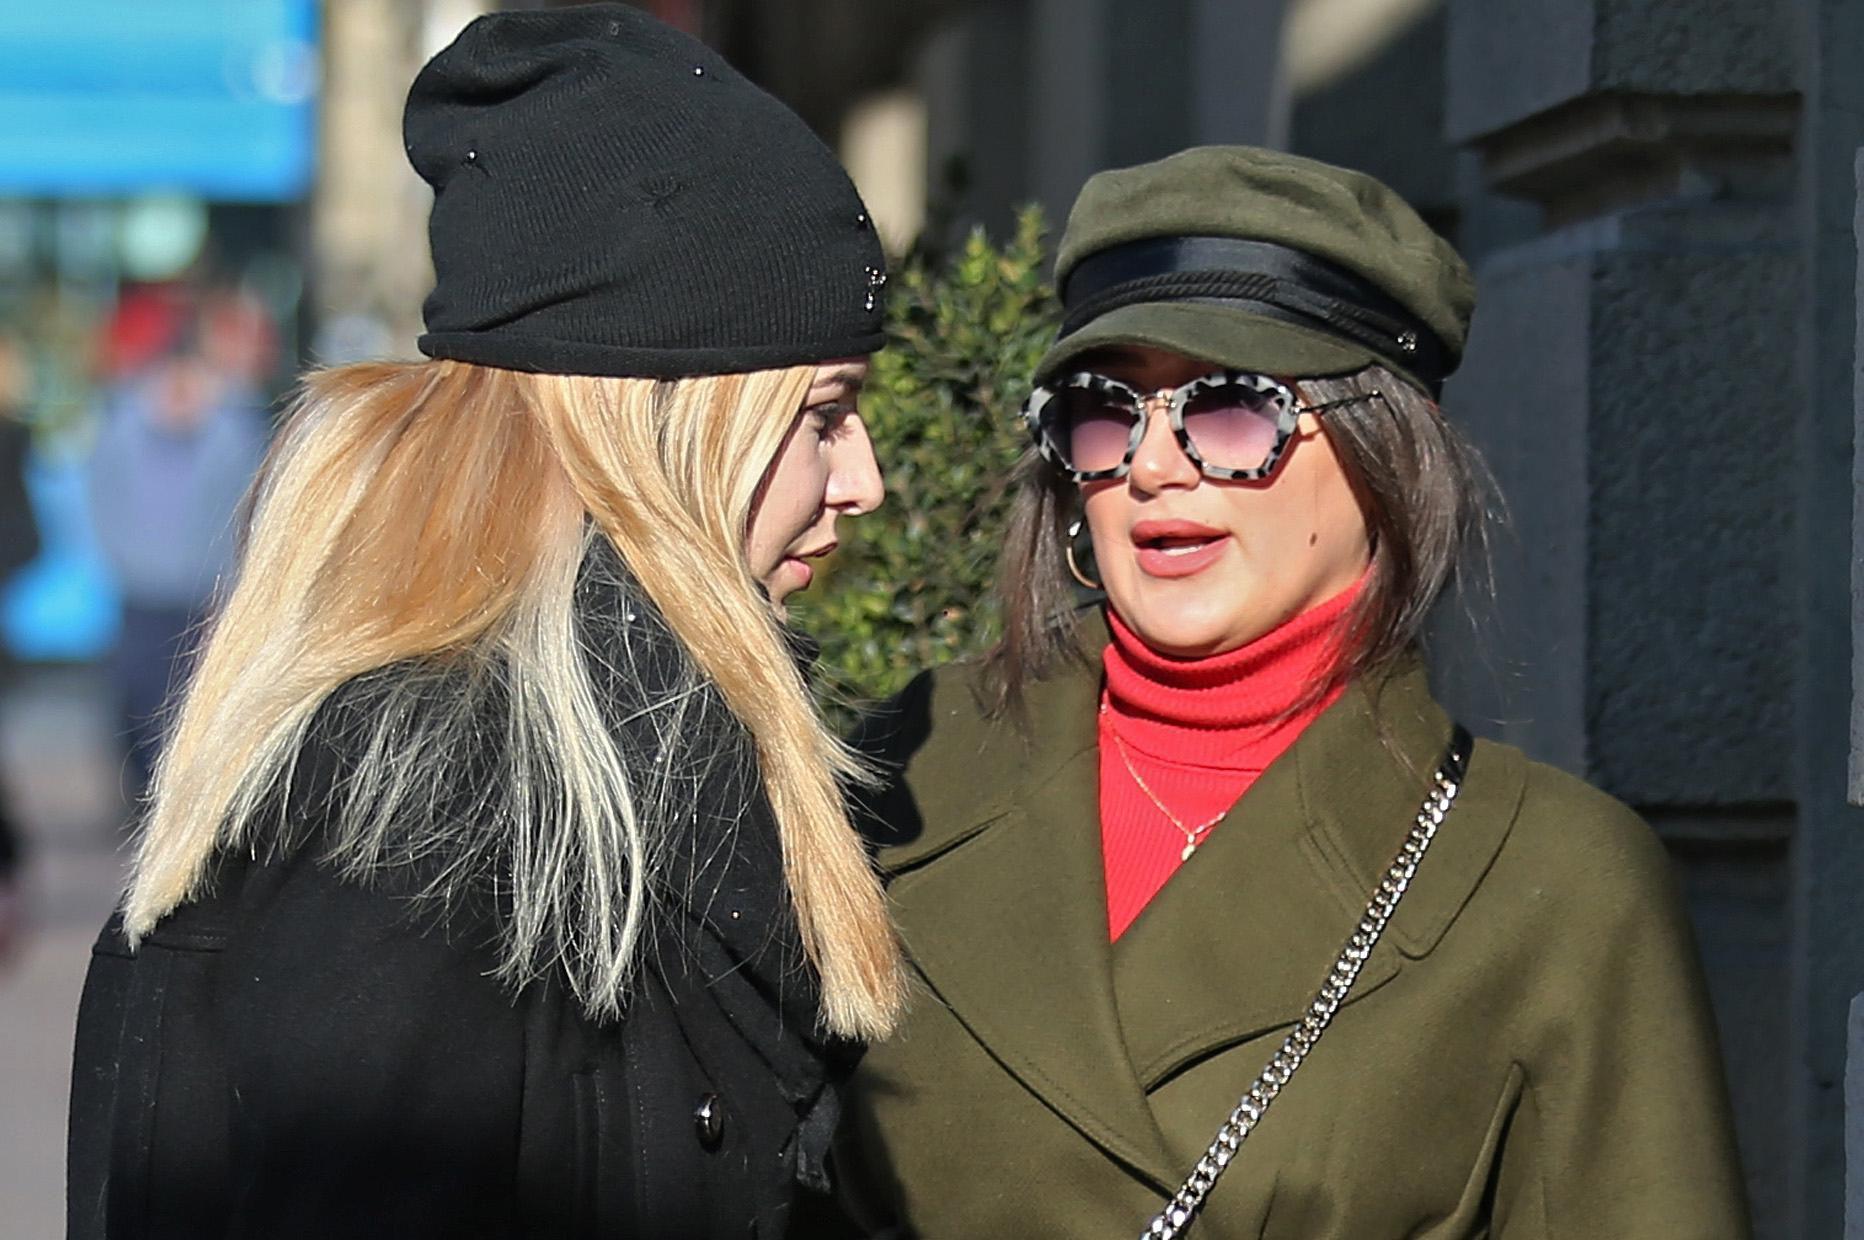 Dvije prijateljice pokazale kombinacije kojih se ne bi posramile ni ulice svjetskih modnih metropola